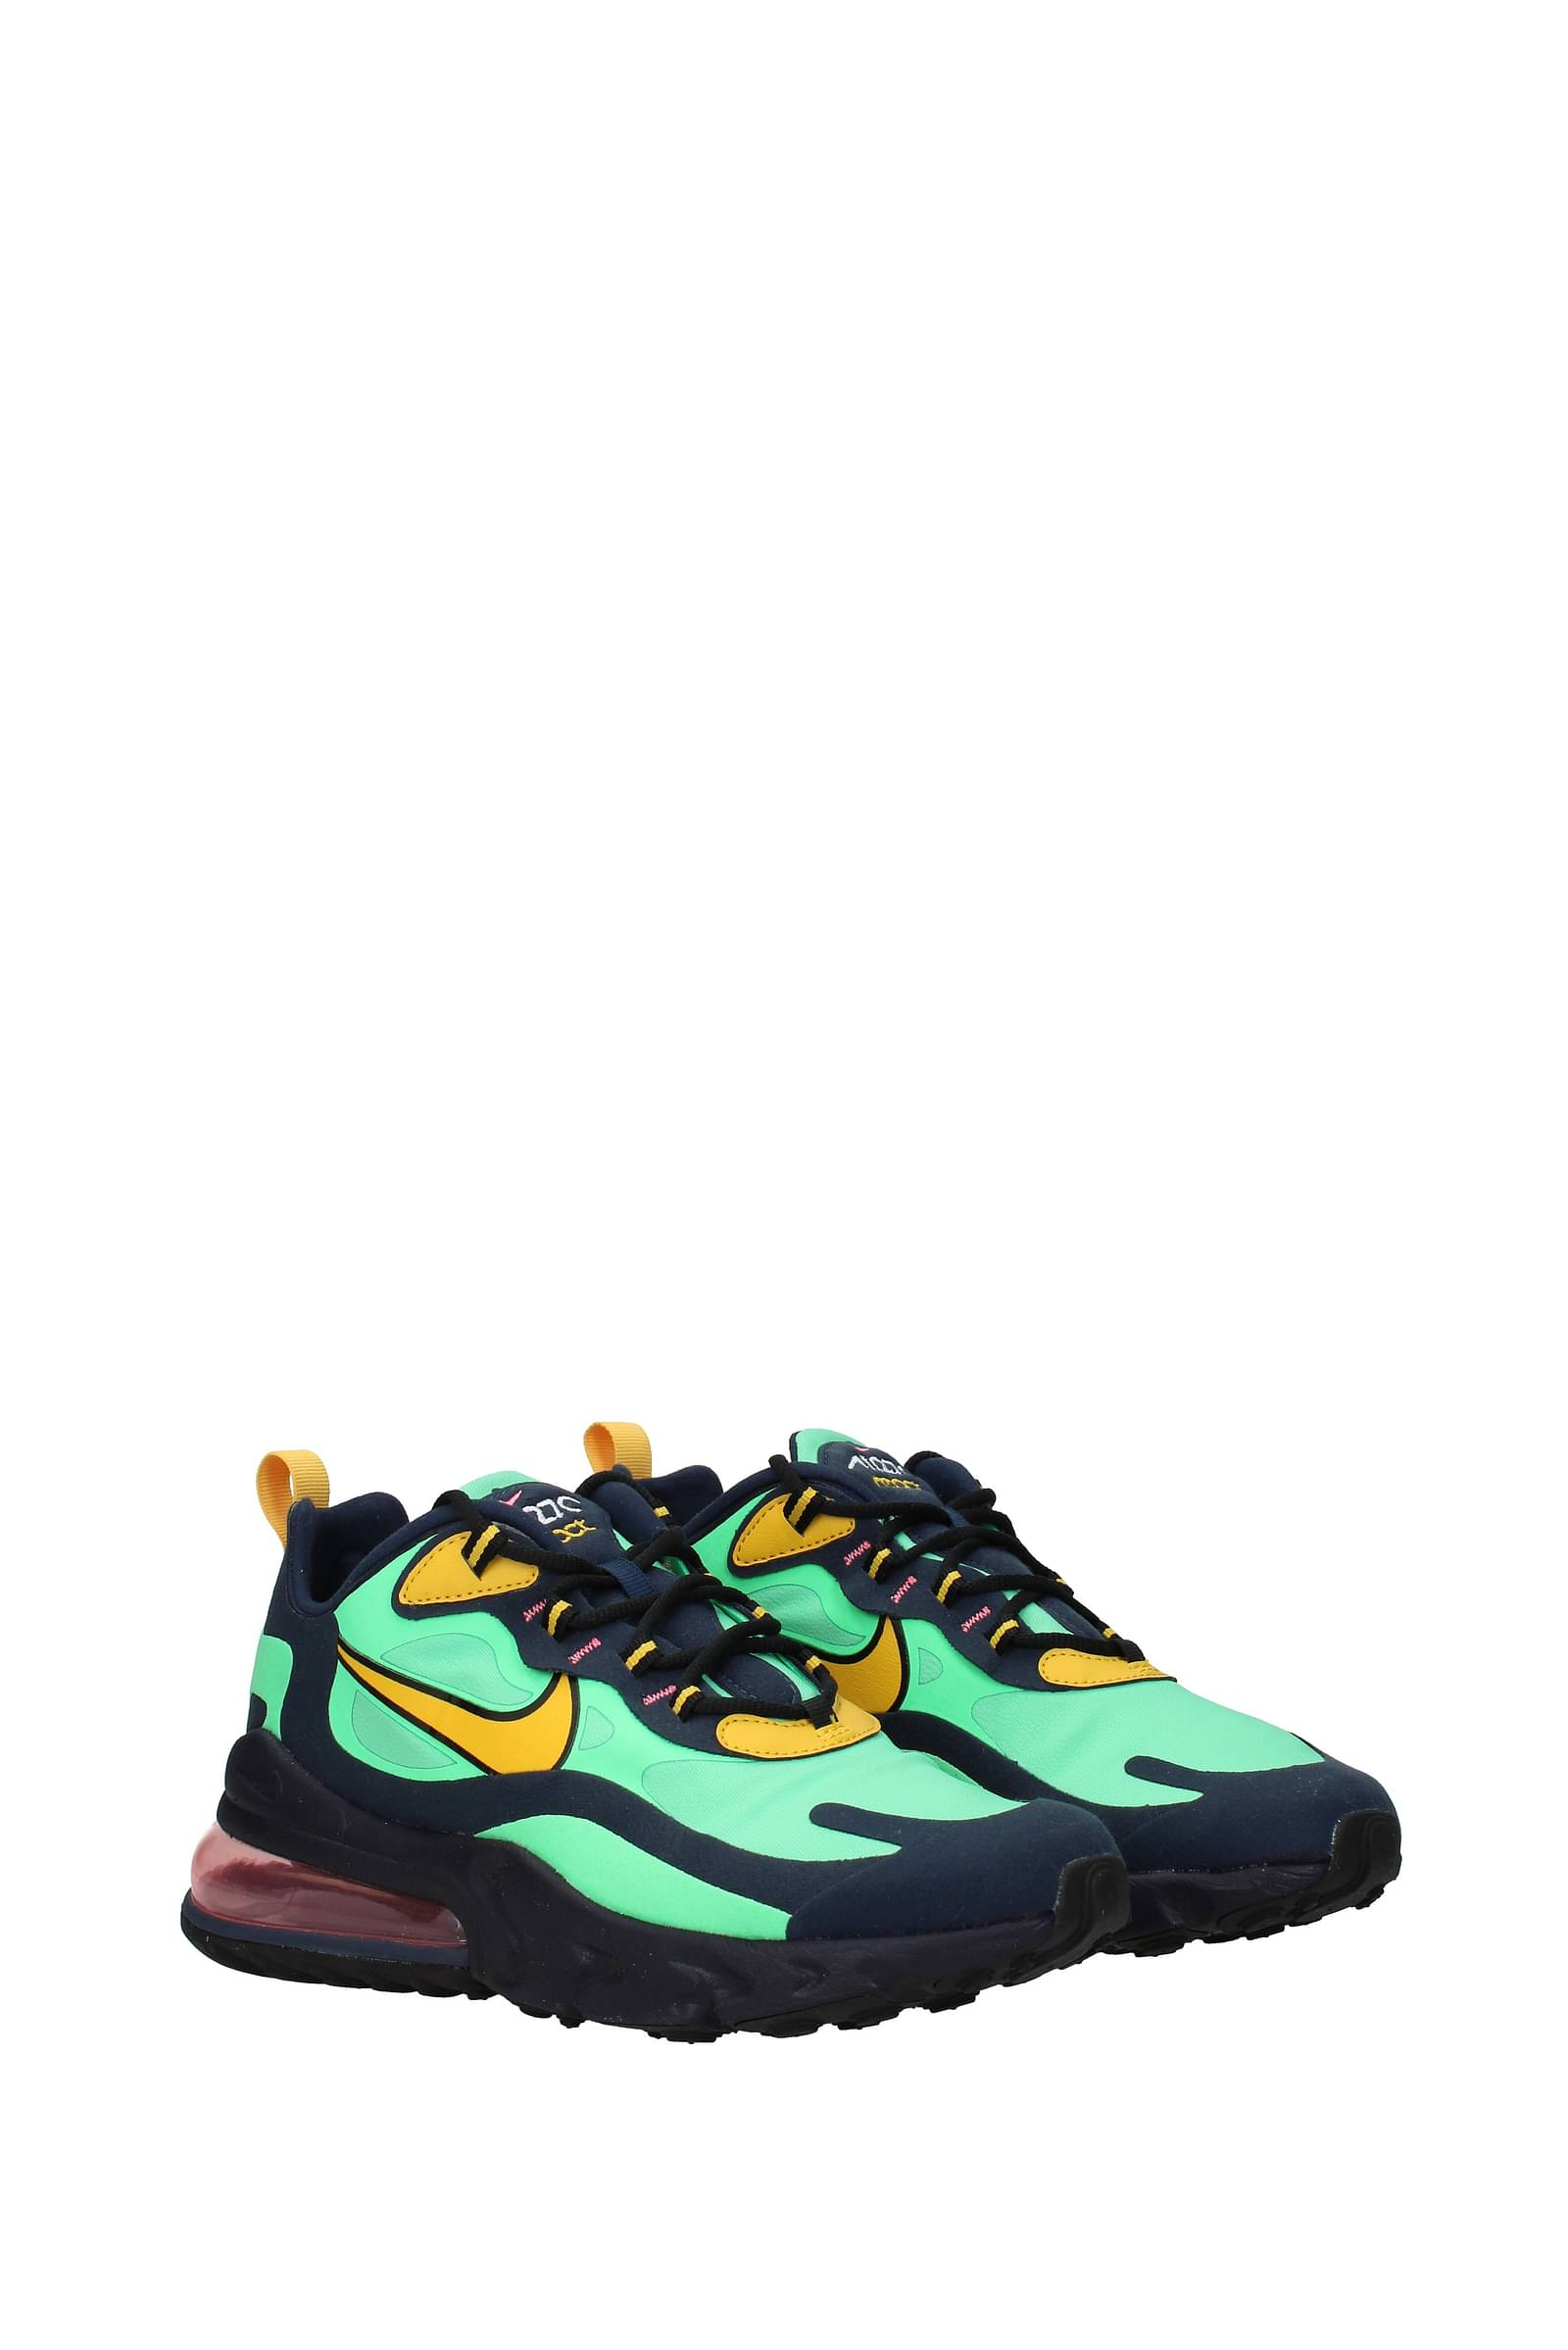 favorito Sistemáticamente Puerto marítimo  Tenis Nike Air Max 270 Hombre-Tela (UA04971)   eBay